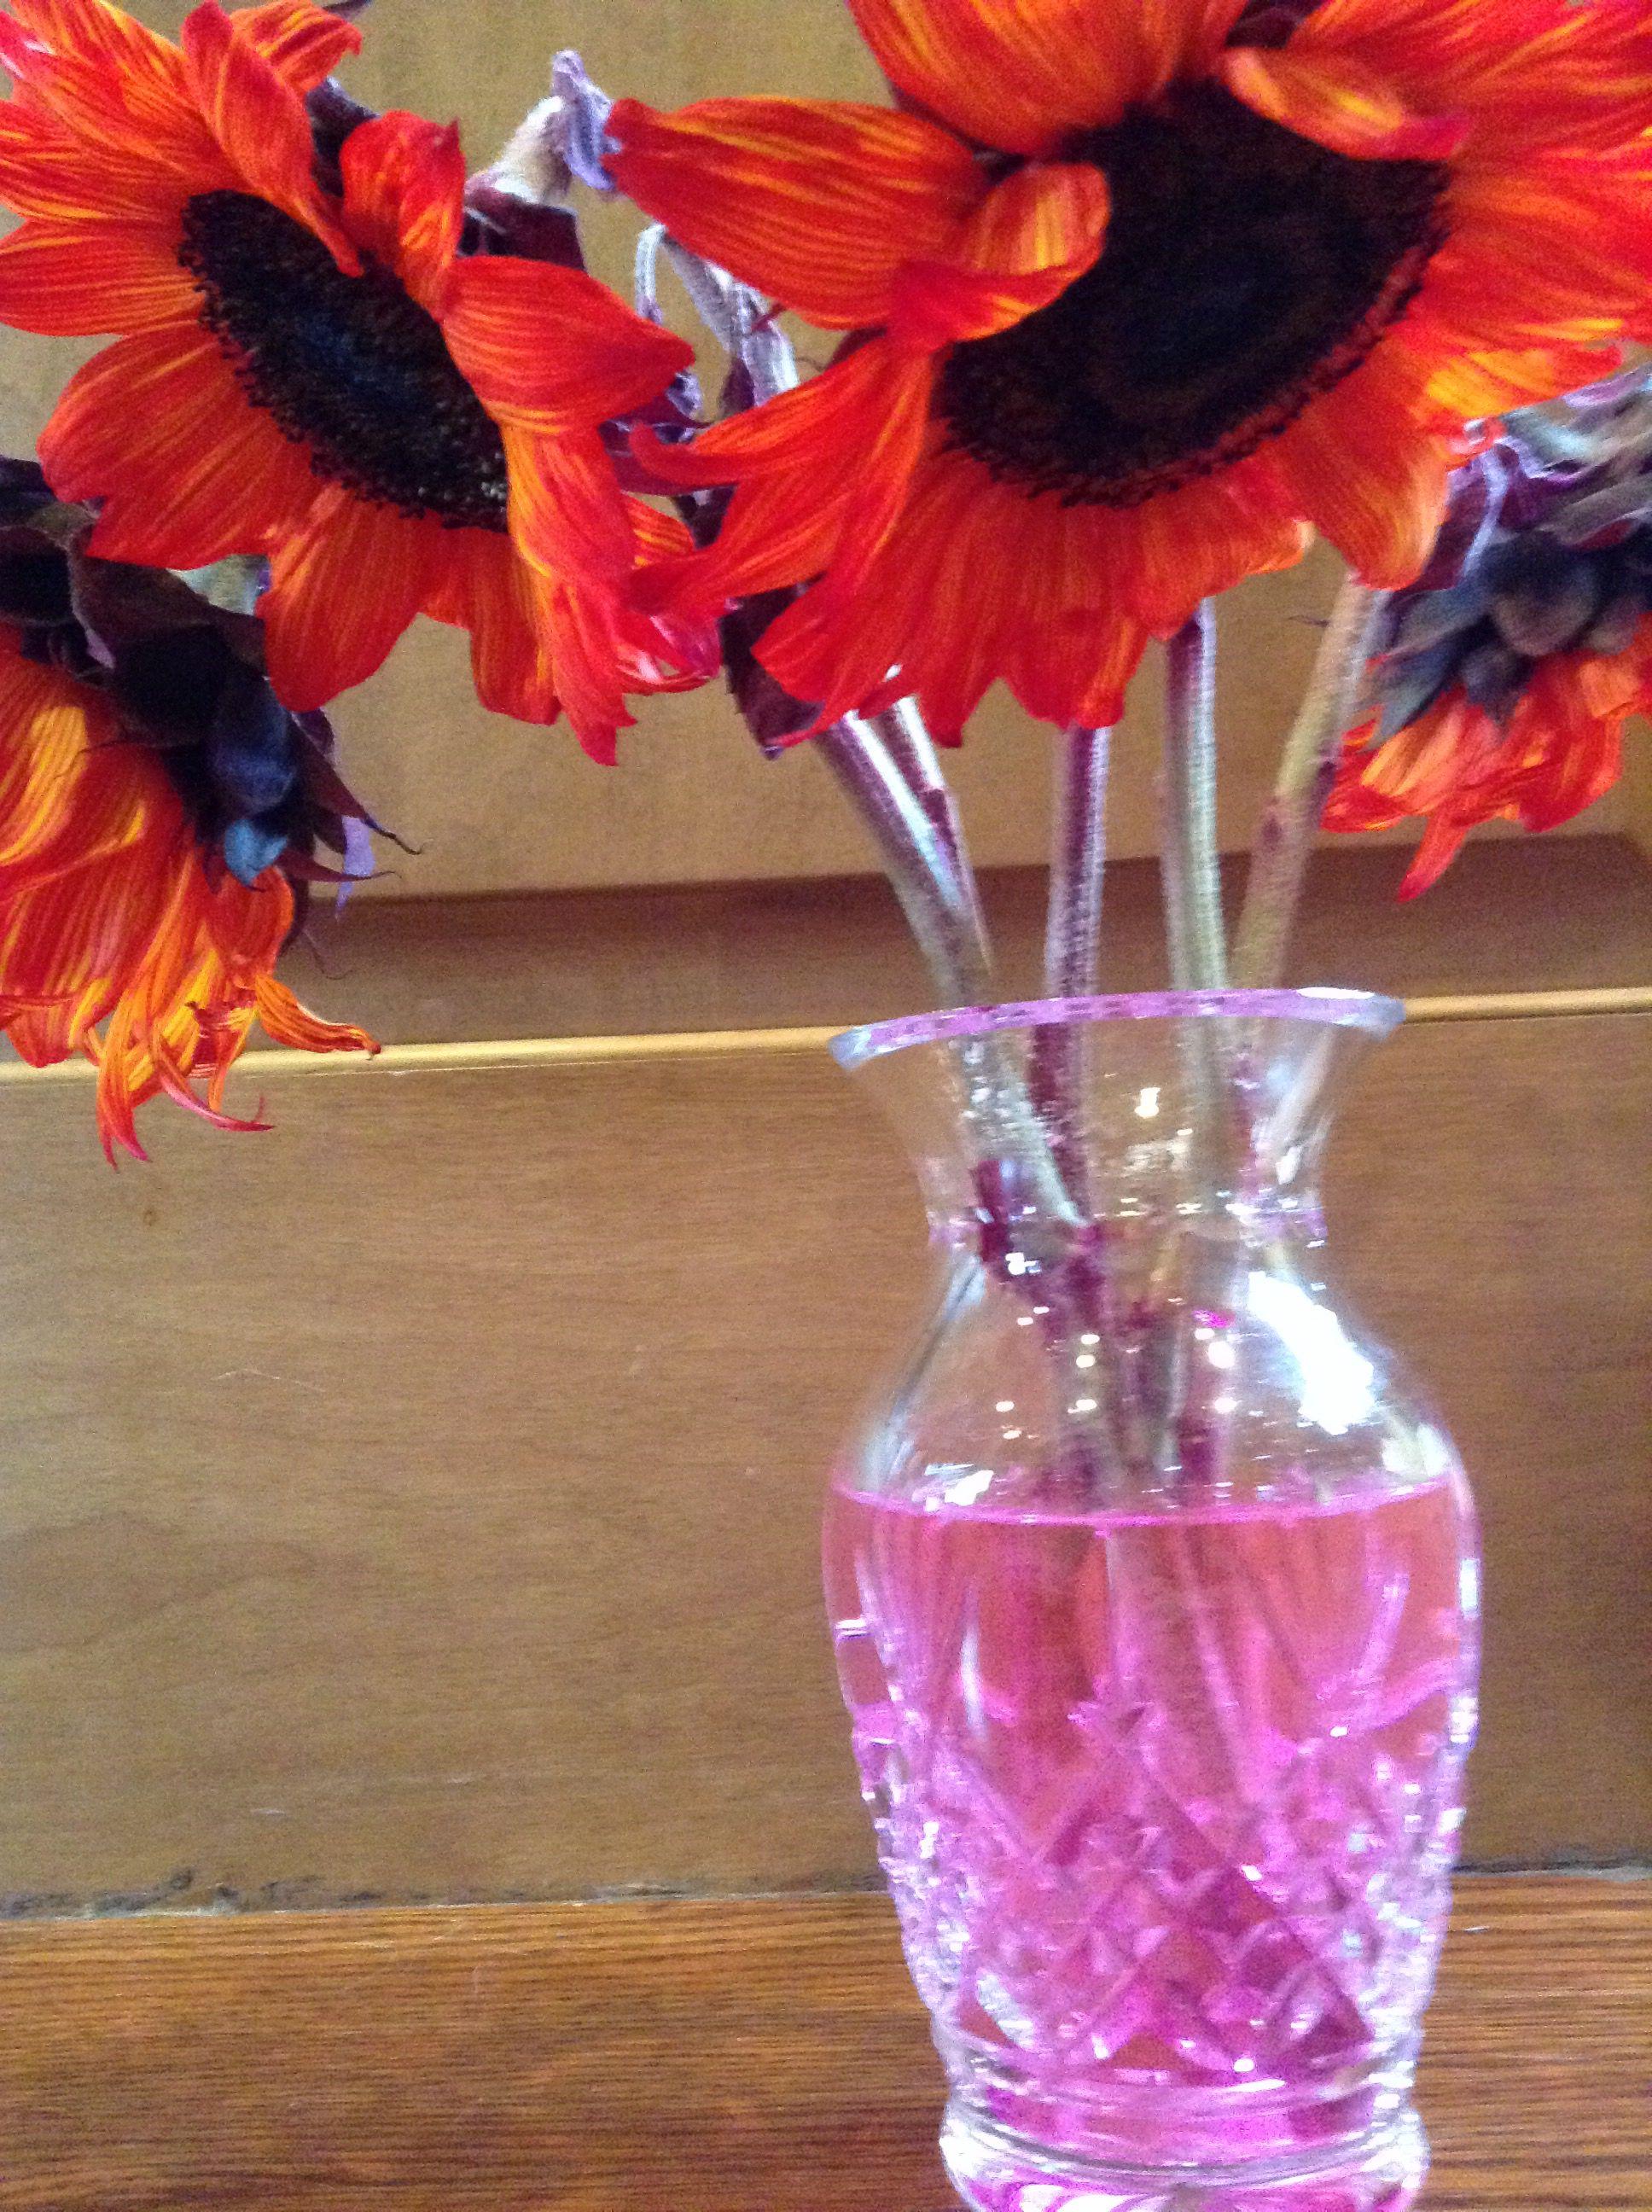 Fancy Food Coloring In Flower Water Pattern - Coloring Paper ...